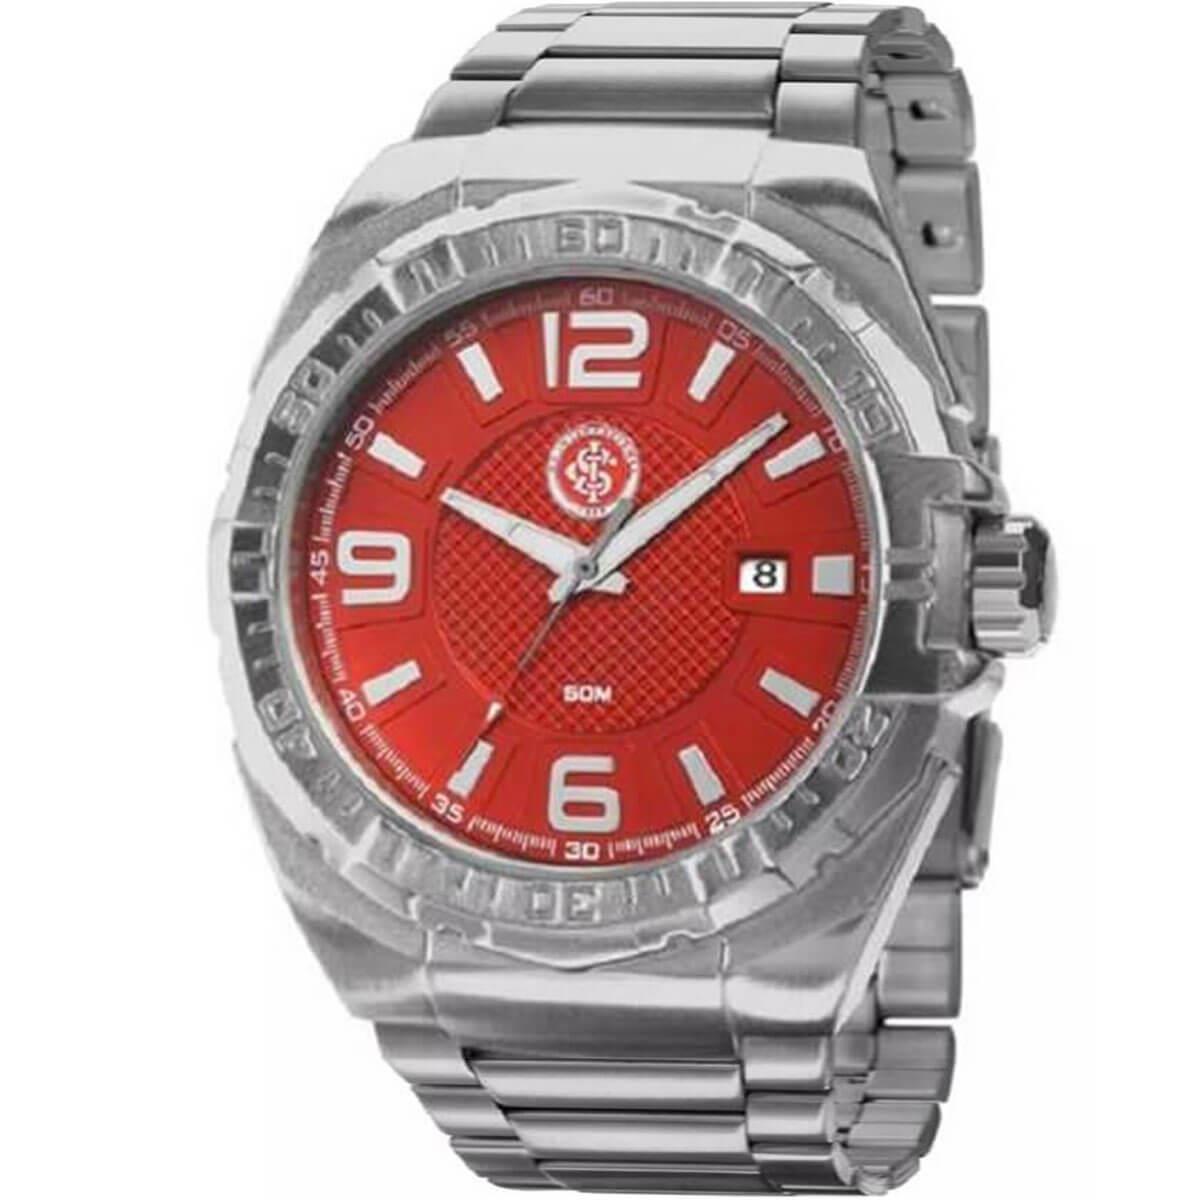 f72c146a276 Relógio Masculino Technos Internacional INT2315AB 3R Aço - Relógio ...